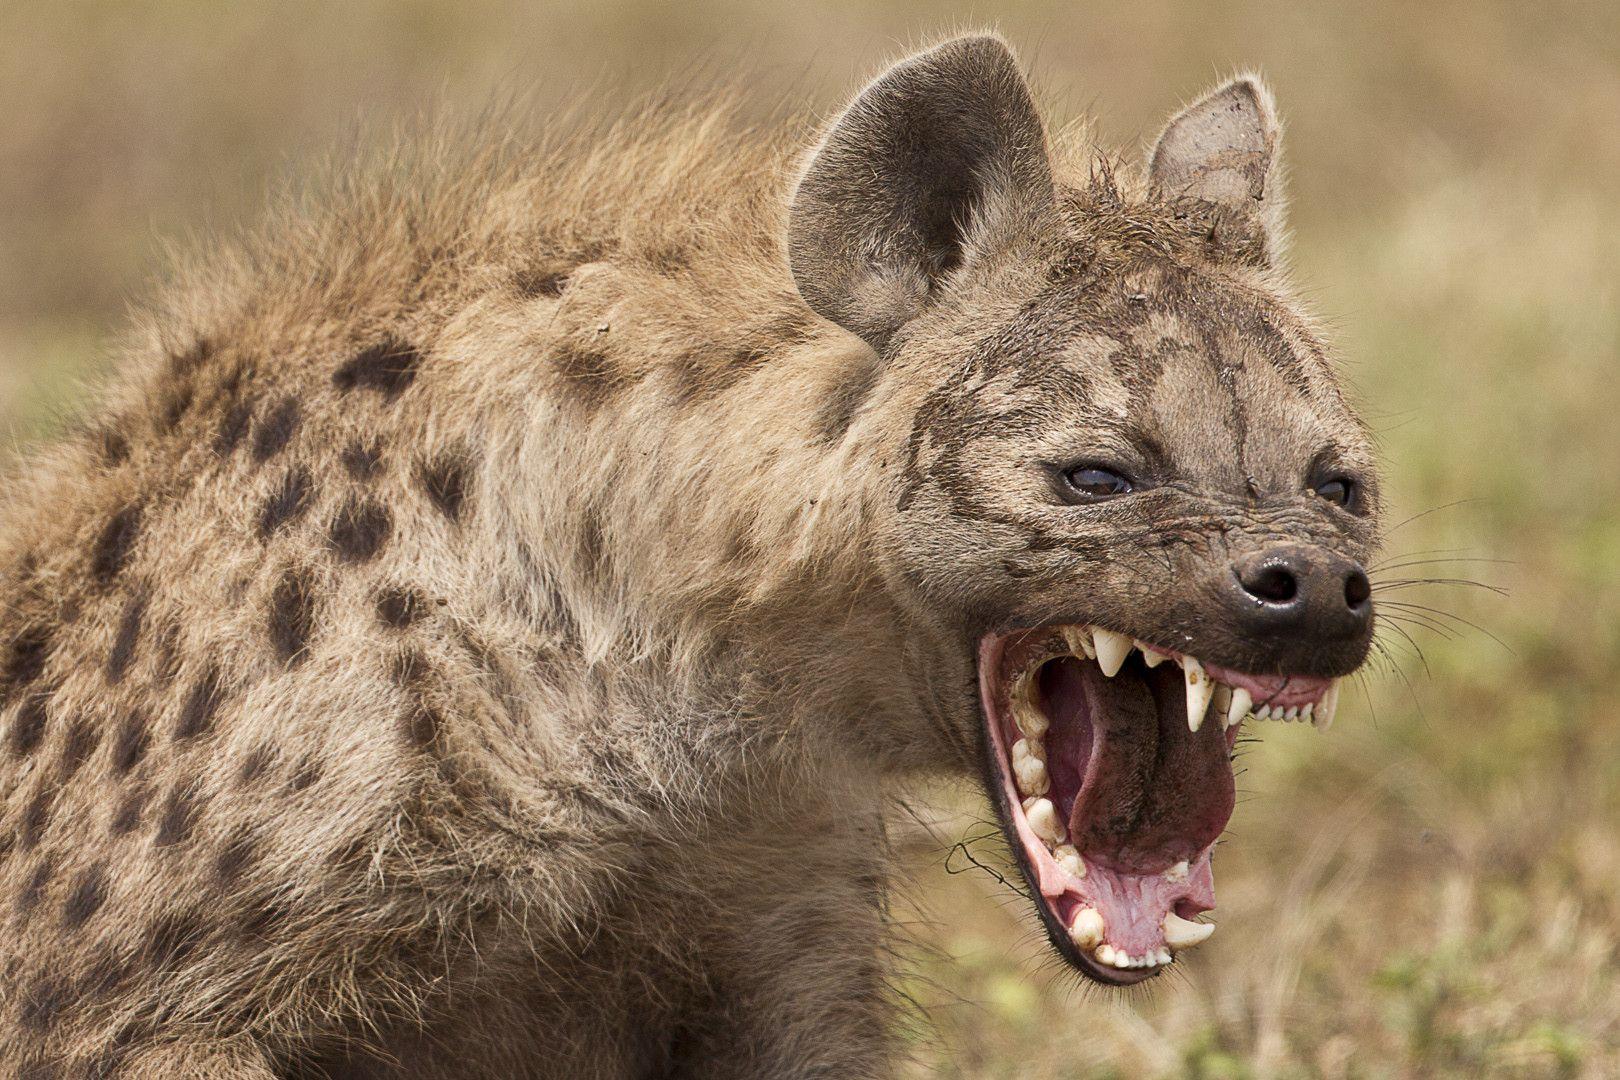 Image of: Lion Wild Animals Prey Animals Giant Animals Cute Pinterest Someones Needs To Freshen Up Fangs Pinterest Hyena Animals